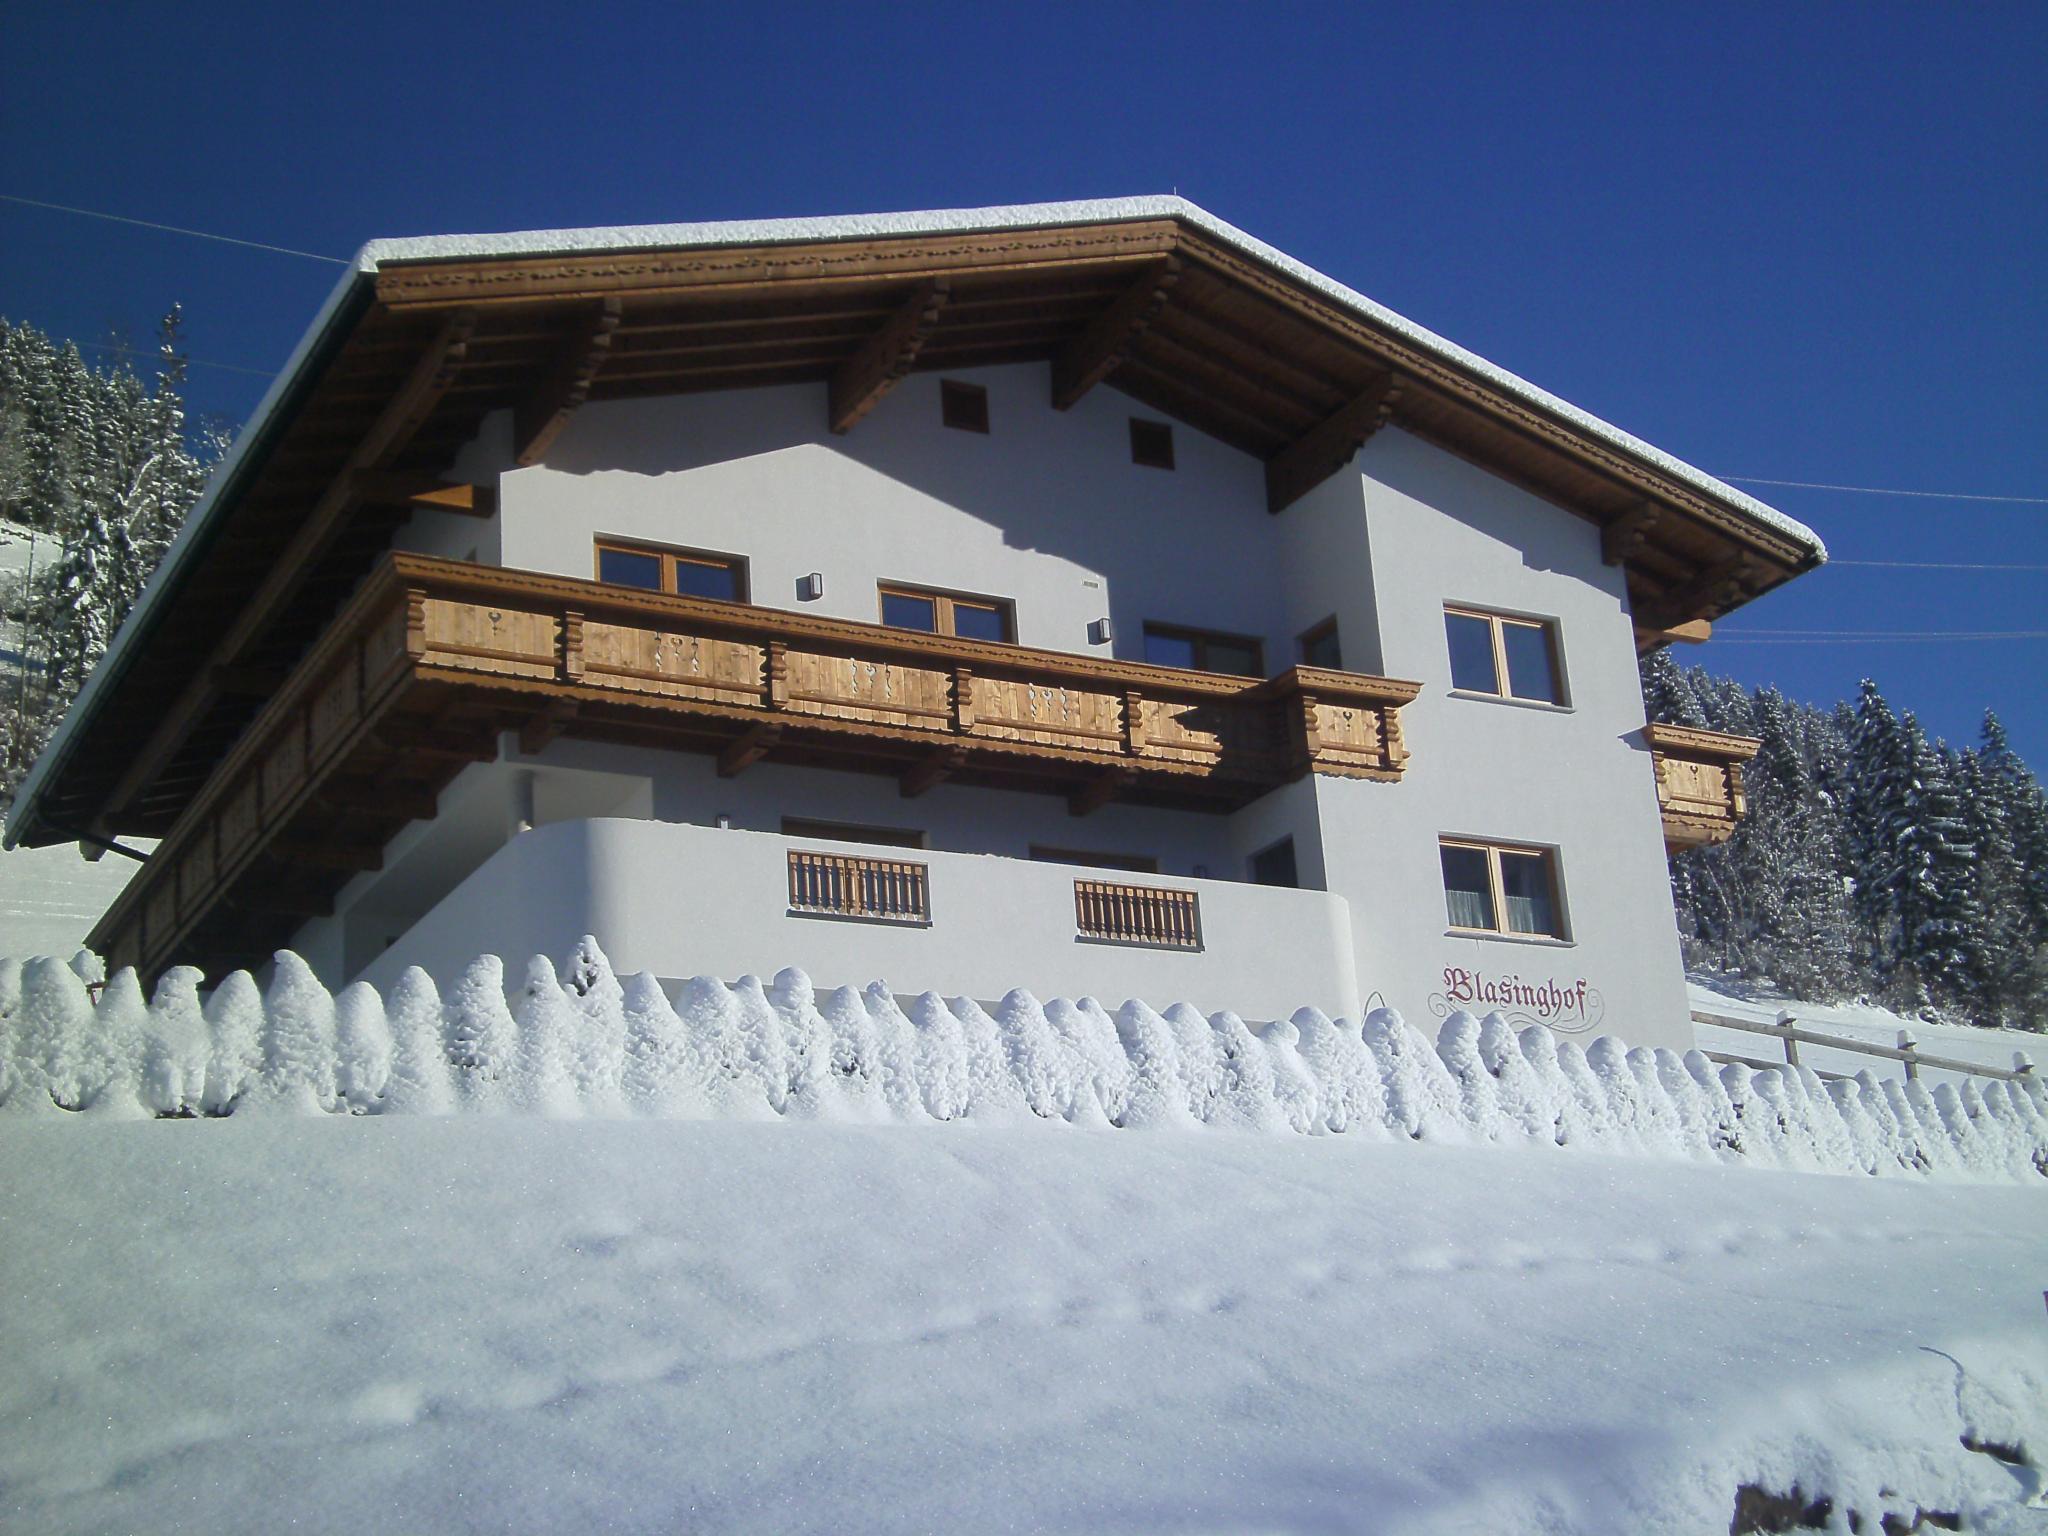 Blasinghof Tirol